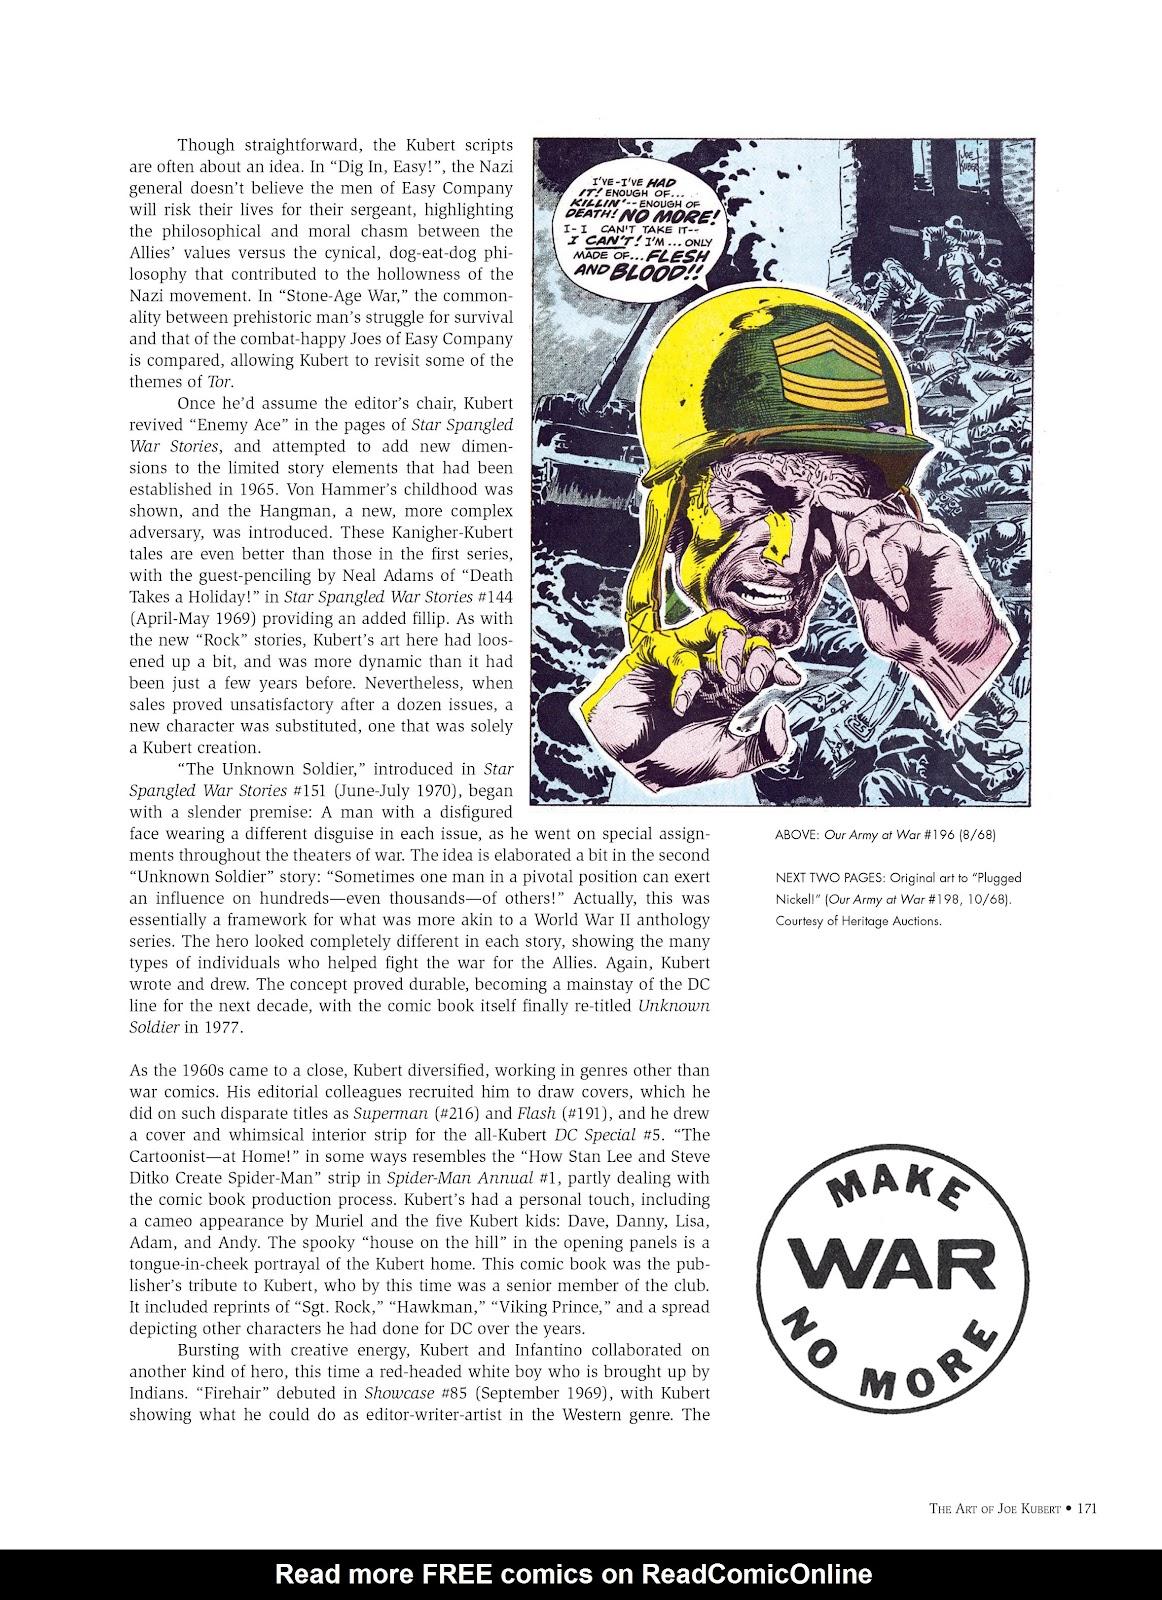 Read online The Art of Joe Kubert comic -  Issue # TPB (Part 2) - 71